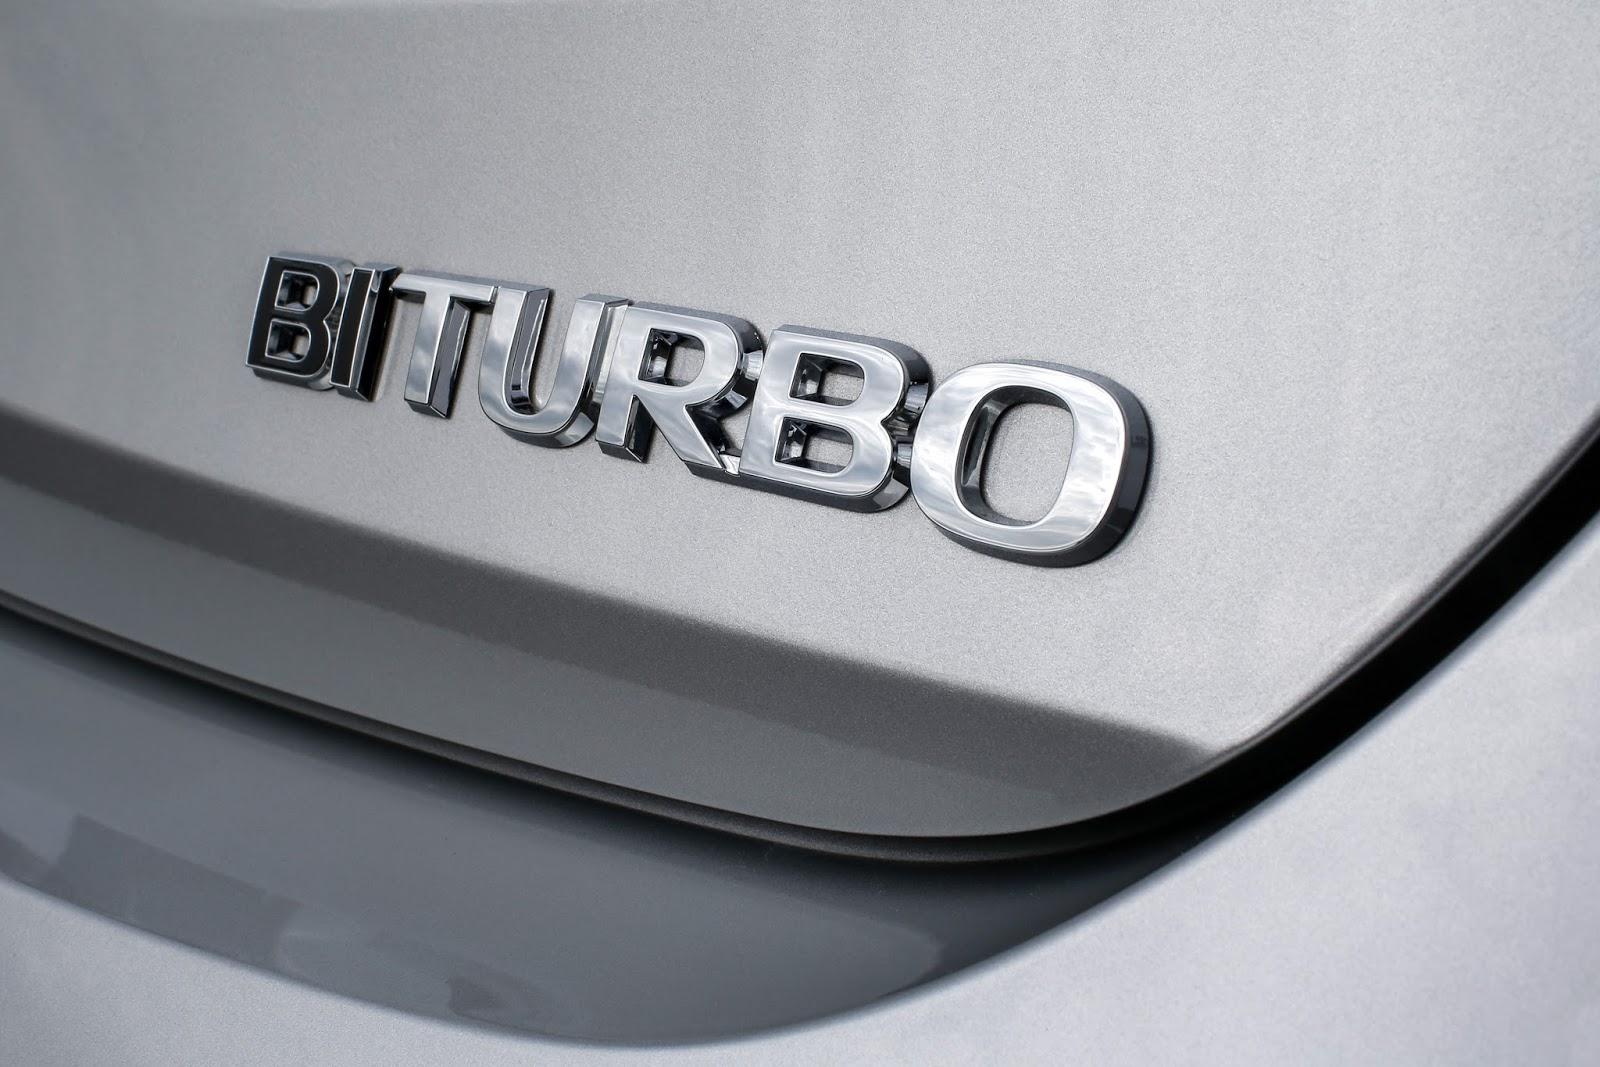 Opel Astra BiTurbo 5 door 301332 Το καυτό Opel Astra BiTurbo diesel συνδυάζει τις επιδόσεις με την οικονομία! Hatchback, Opel, Opel Astra, Opel Astra BiTurbo, Opel Astra BiTurbo Hatchback, twin-turbo